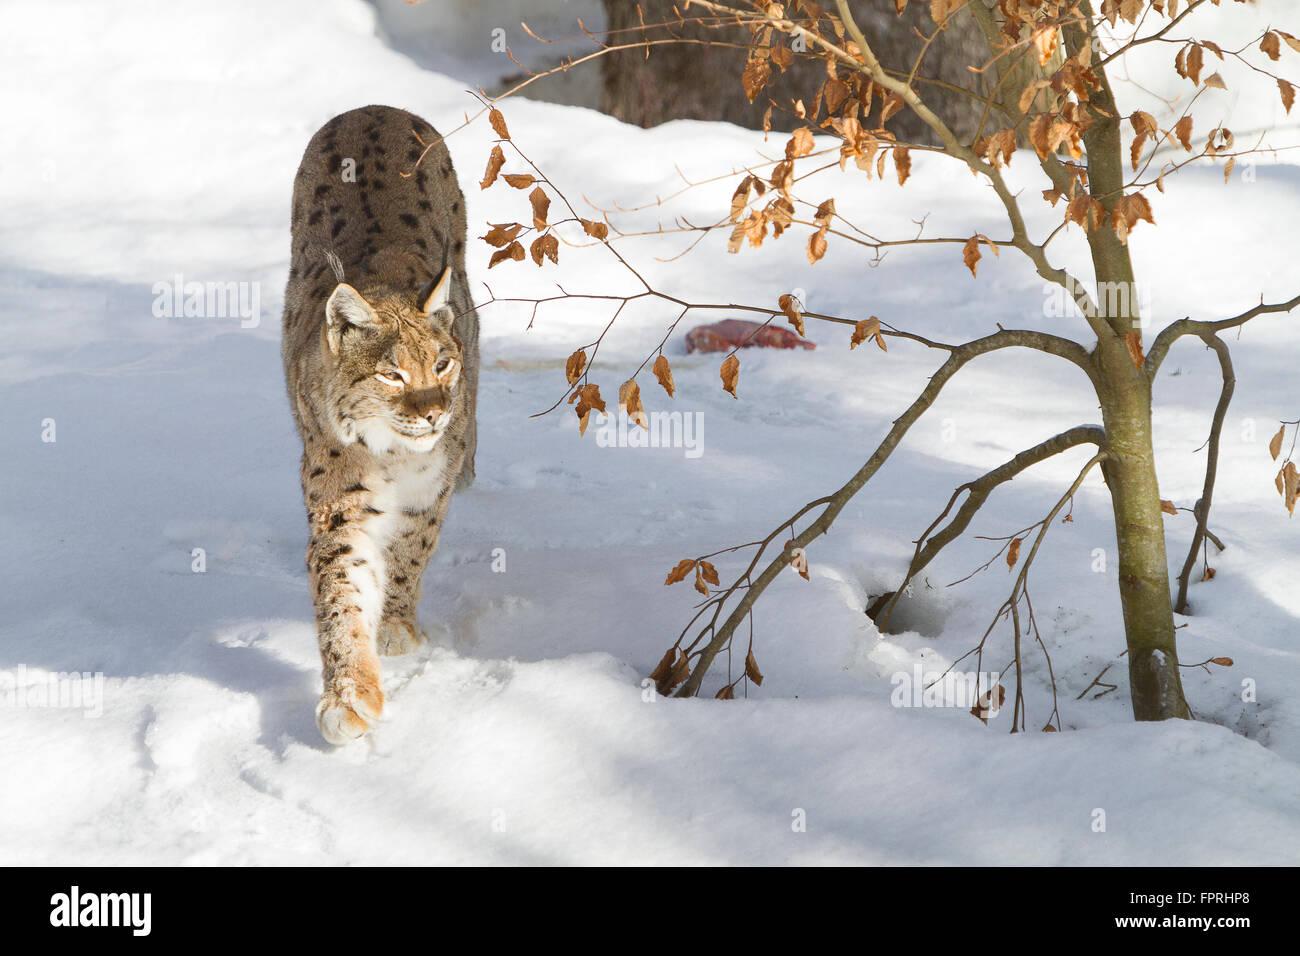 Eurasian lynx (Lynx lynx) walking in the snow, in bavarian forest Germany Stock Photo